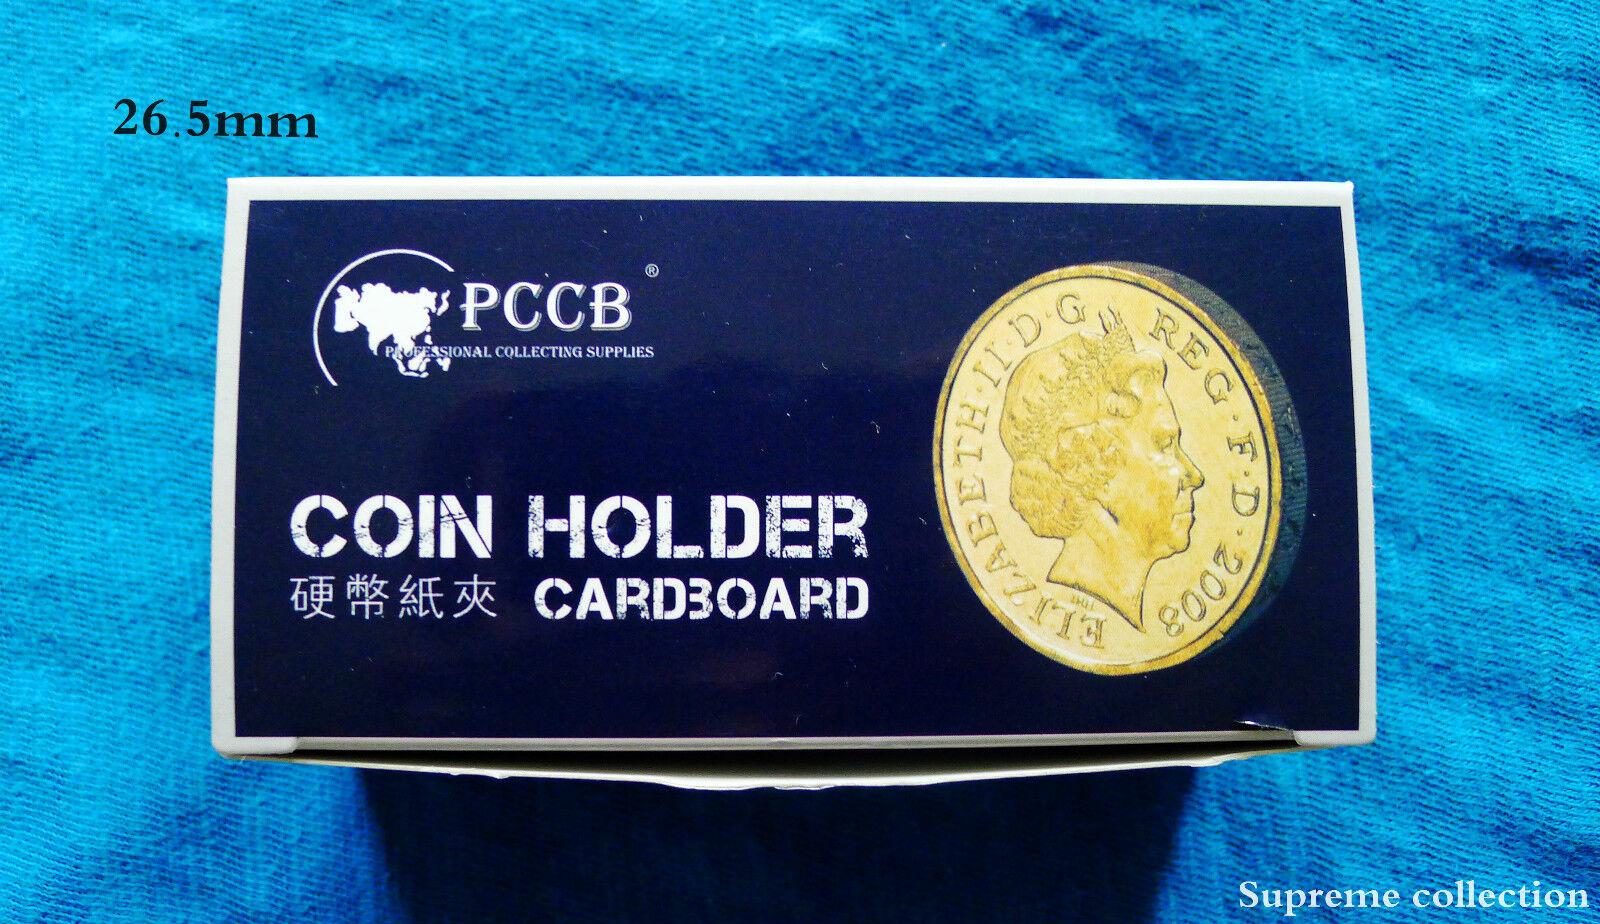 NEW 100 PCS COIN HOLDERS 2 X 2 CARDBOARD MYLAR FLIPS  DIAMETER 26.5MM ( US QUARTER )